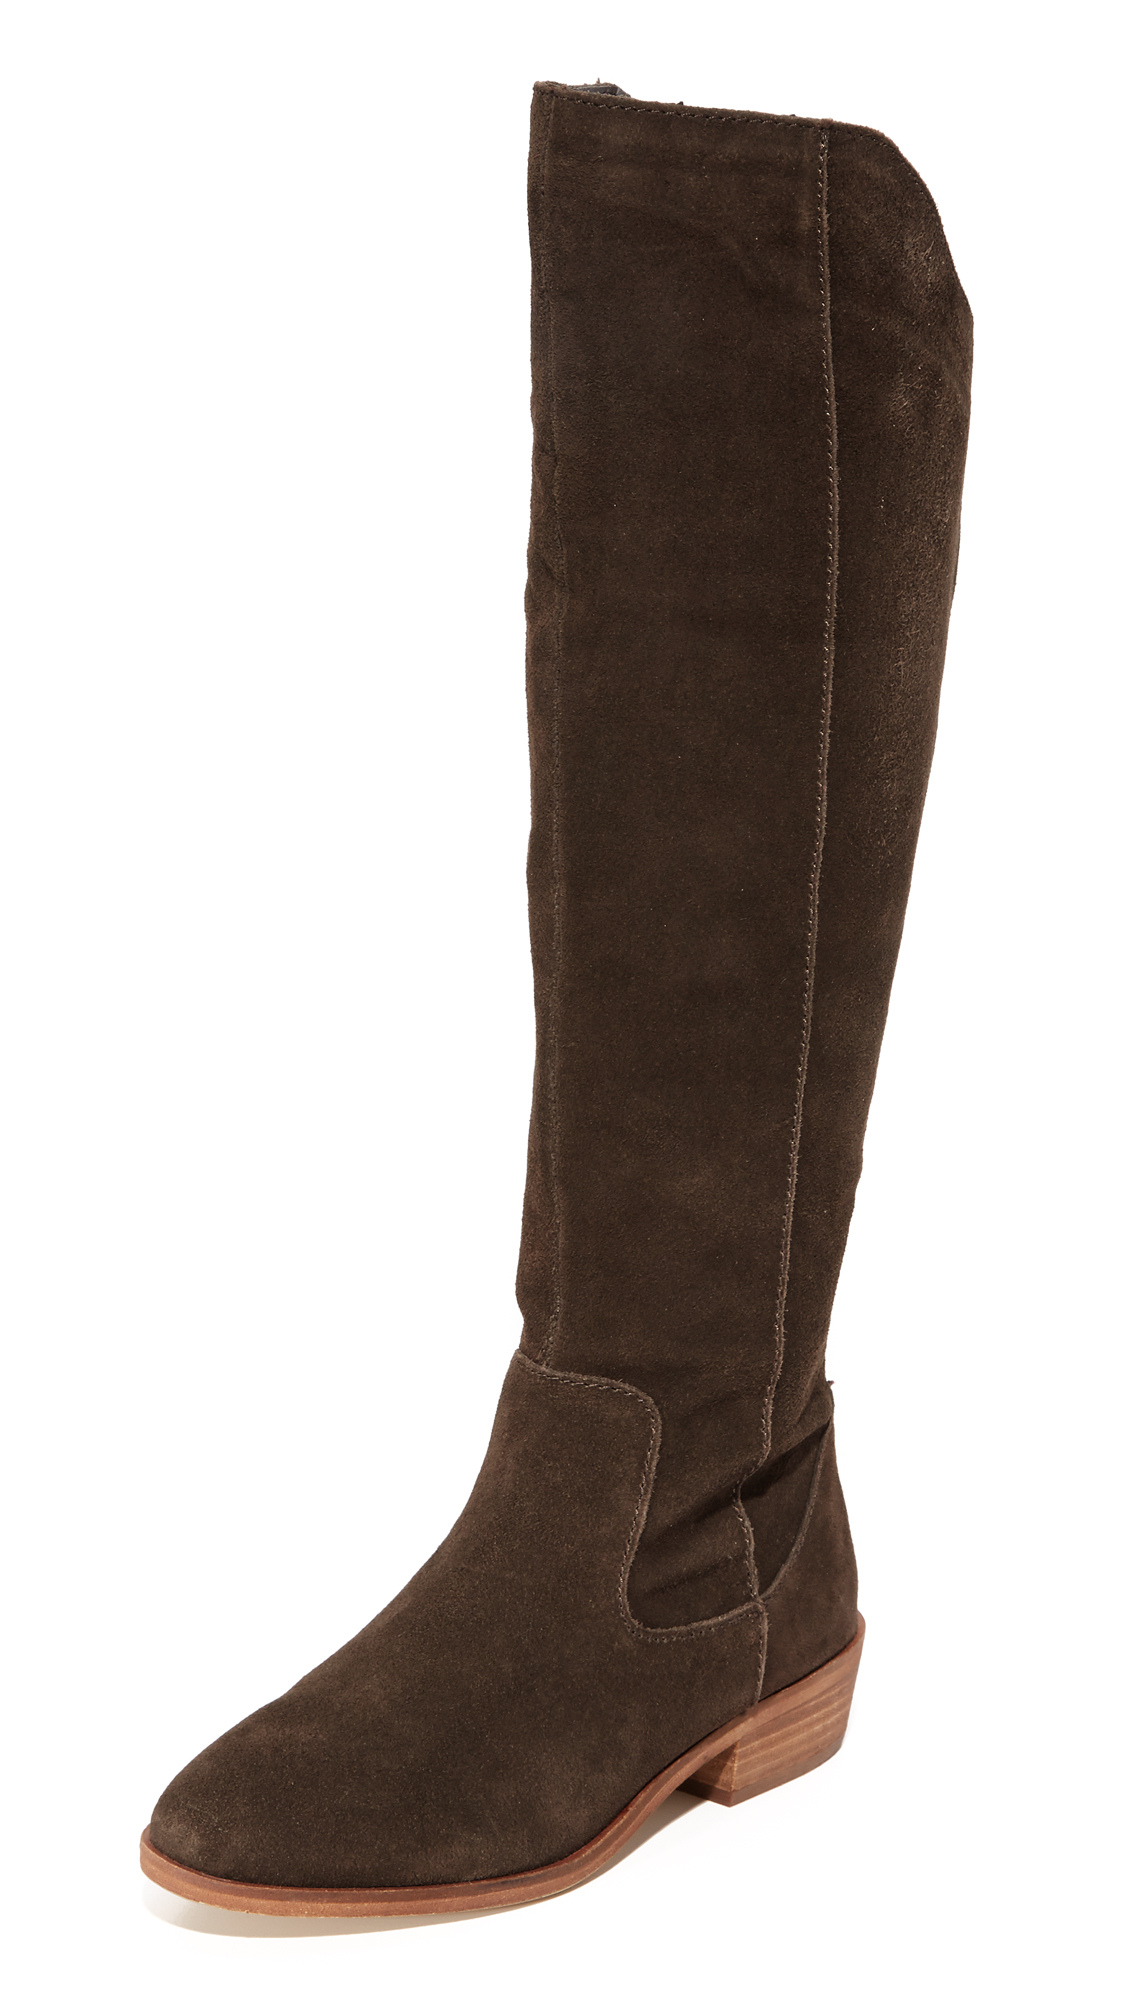 Steven Emmery Tall Boots - Dark Brown